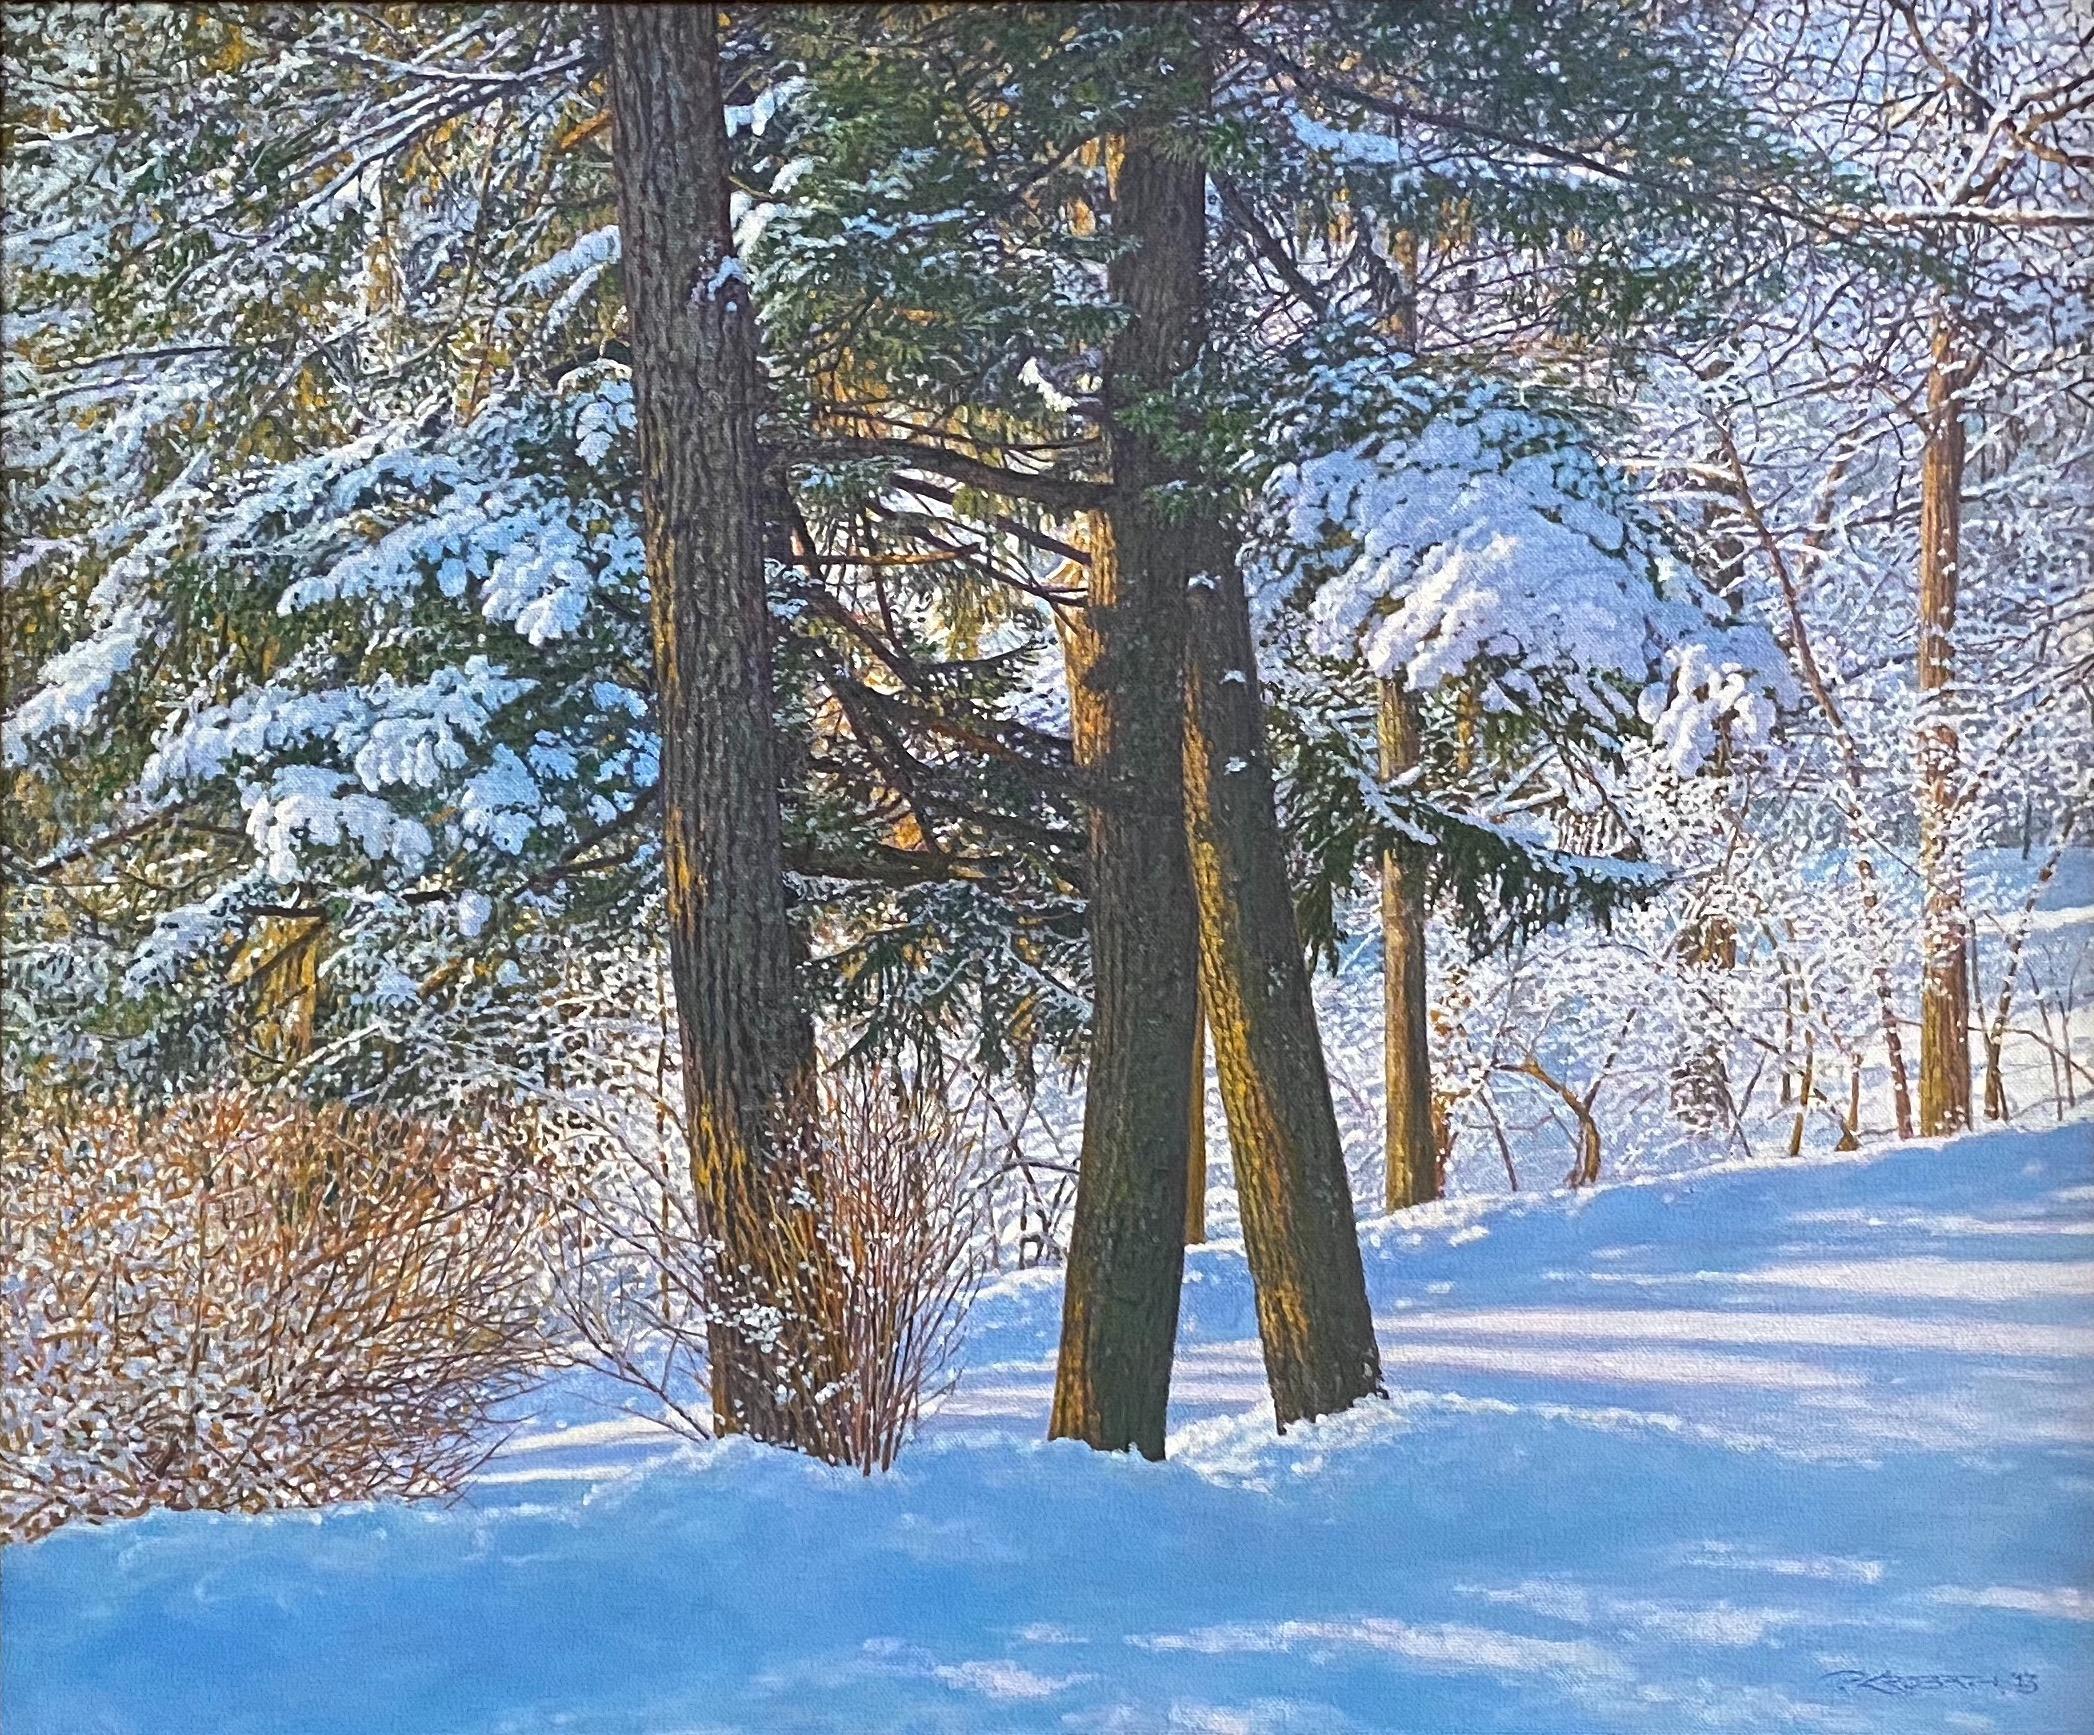 Cedars in the Snow